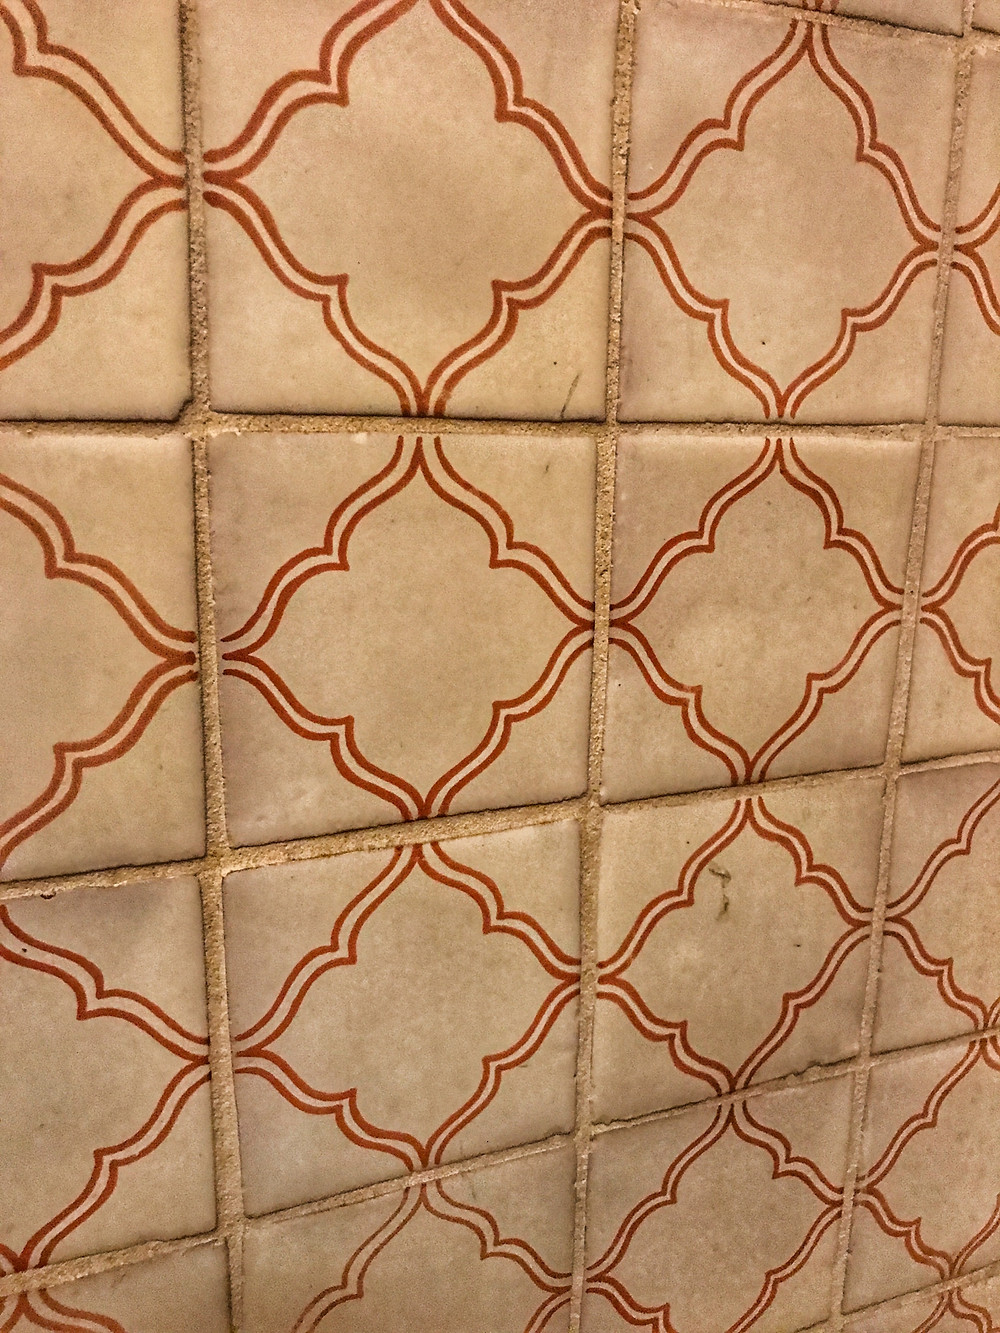 Wall Tile, Skipper Canteen Restroom